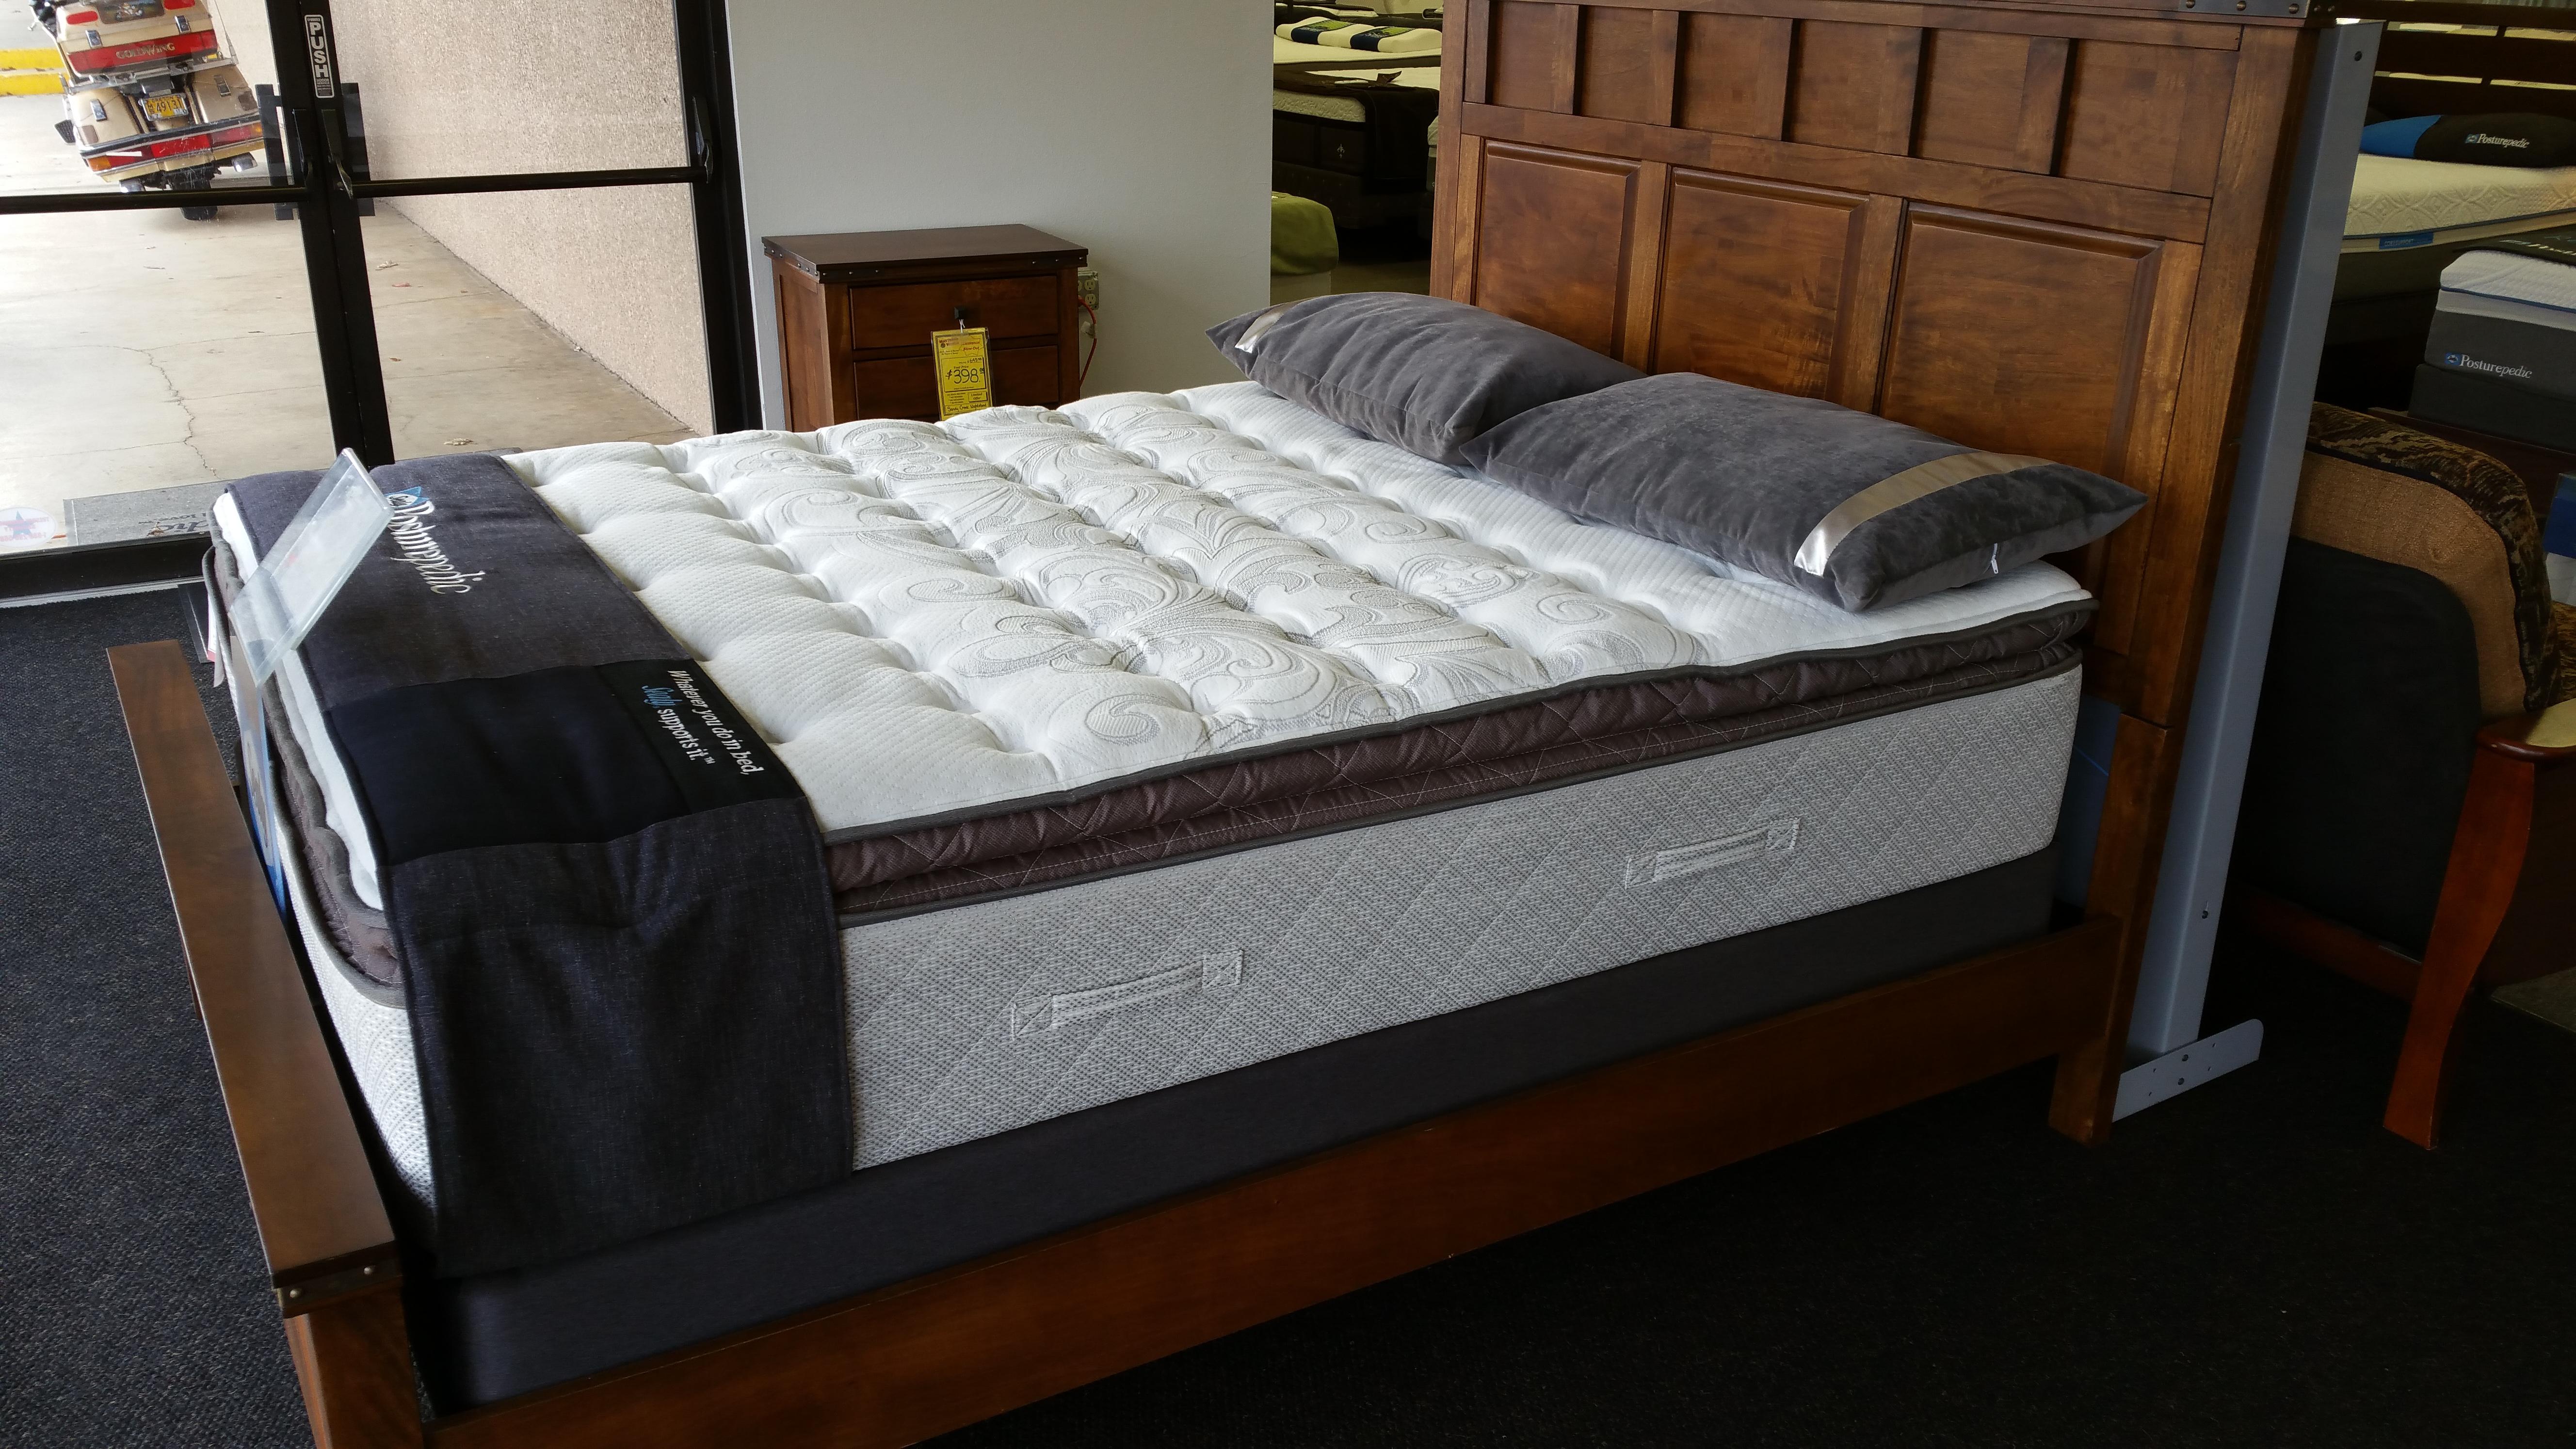 mattress world mattress world in tulsa ok 74129 chamberofcommerce mattress world mattress. Black Bedroom Furniture Sets. Home Design Ideas